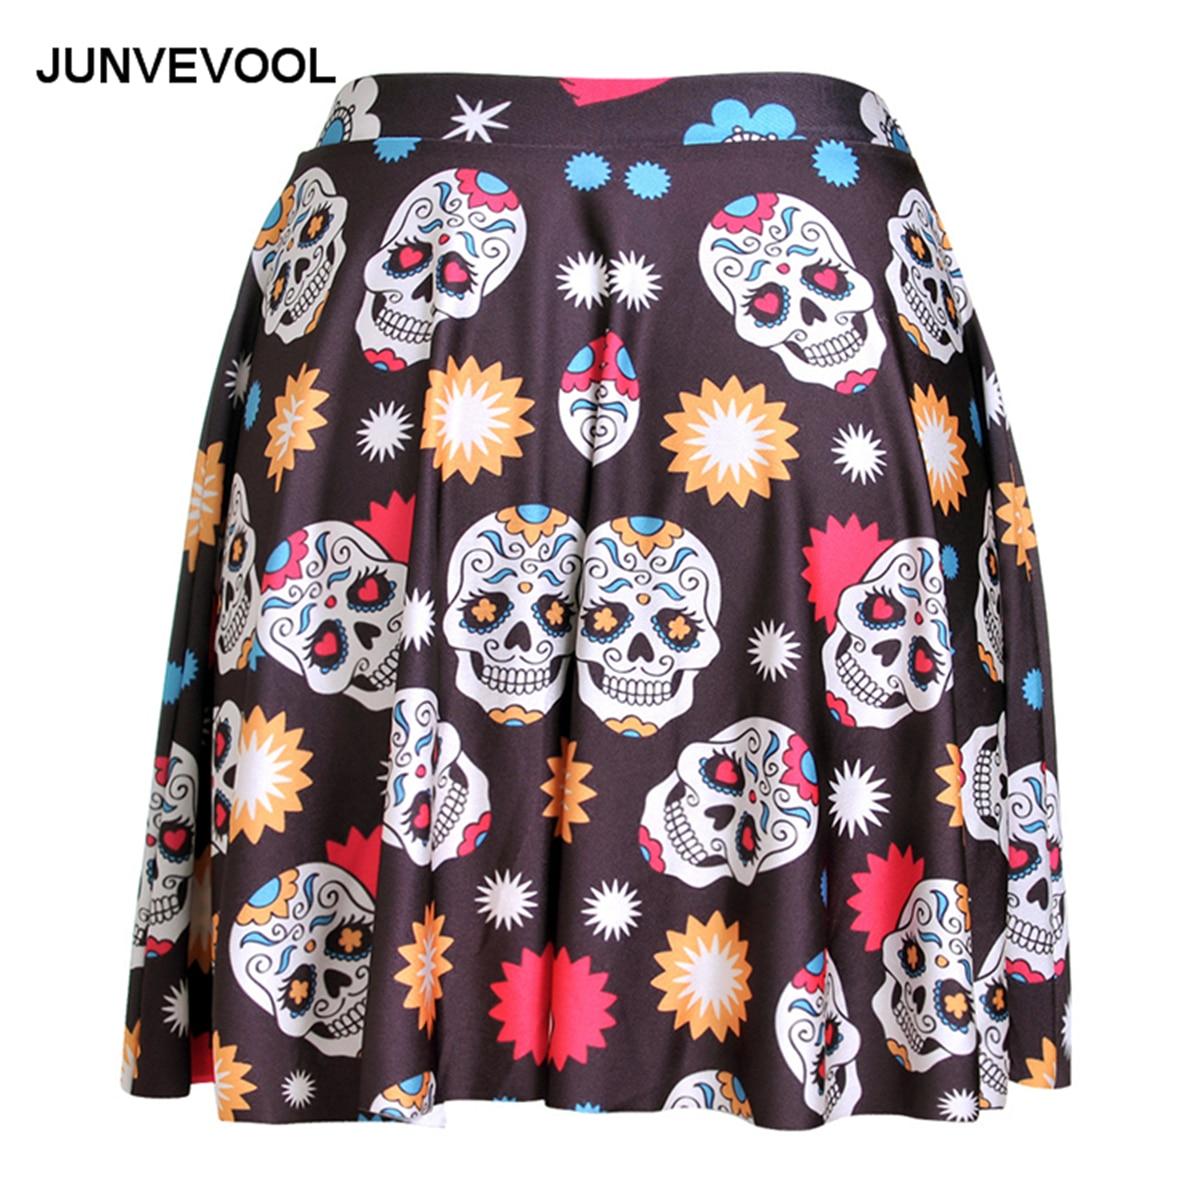 Skull 3D Printed Women Skirt Digital Pleated Mini Skirts Ladies Career Office Clothing Girls Club Hot Sale Fashion Styles wear